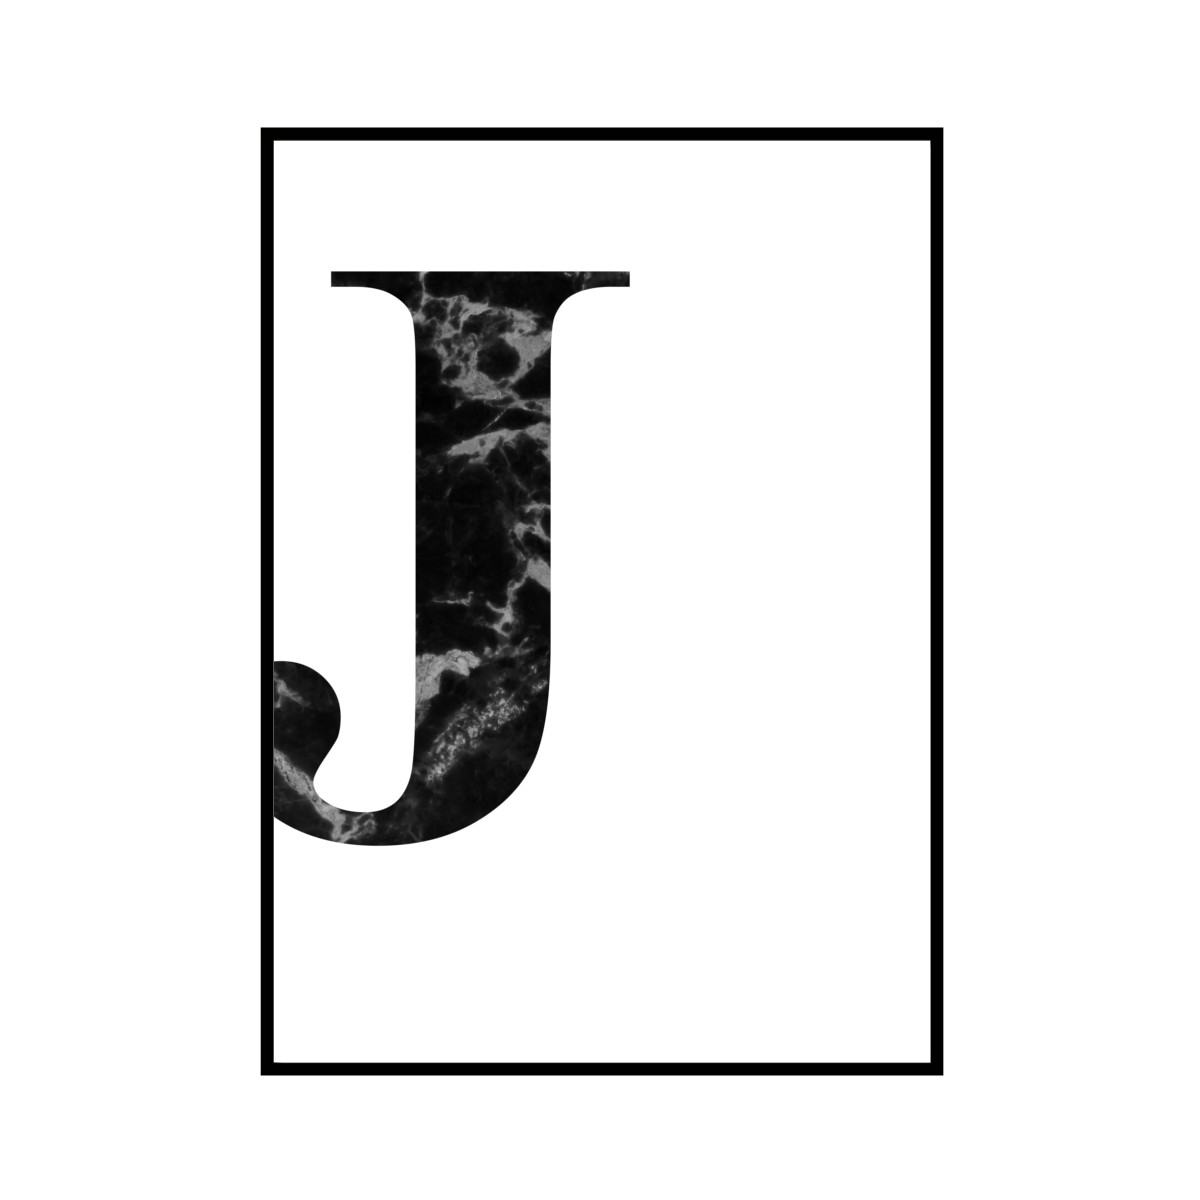 """J"" 黒大理石 - Black marble - ALPHAシリーズ [SD-000511] B4サイズ フレームセット"